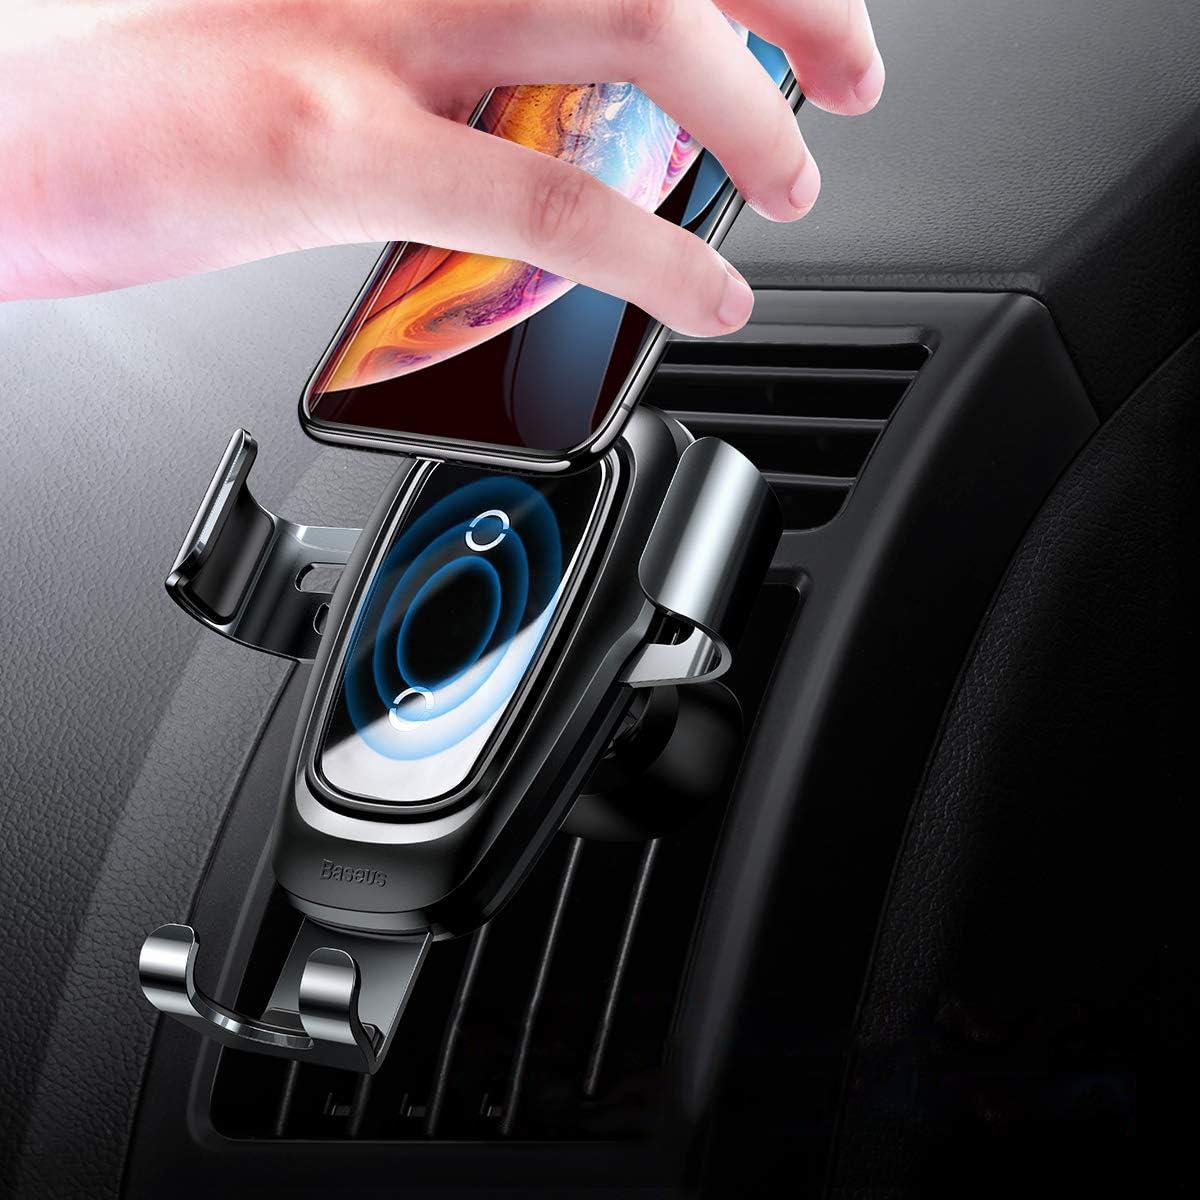 Baseus Cargador Inalámbrico Coche,QI Cargador Coche Carga Rápida con Rejillas del Aire, Automático 360 ° con base de carga para iPhone 11 Pro / X / 8/8 Plus, Samsung Galaxy S9 S8, HUAWEI Mate 20 Pro